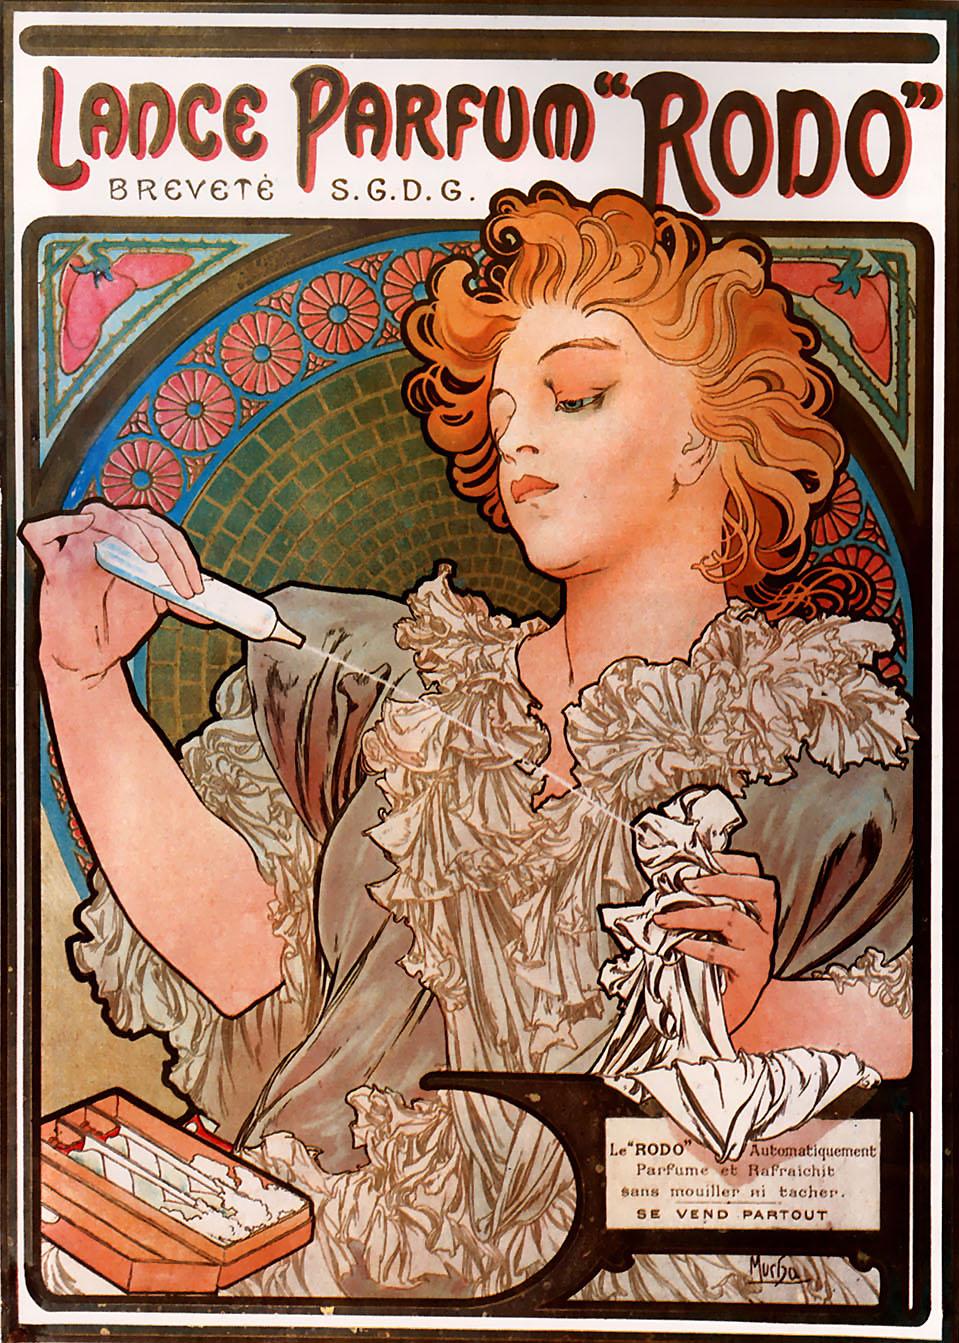 Alphonse Mucha Print - Lance Parfum Rodo